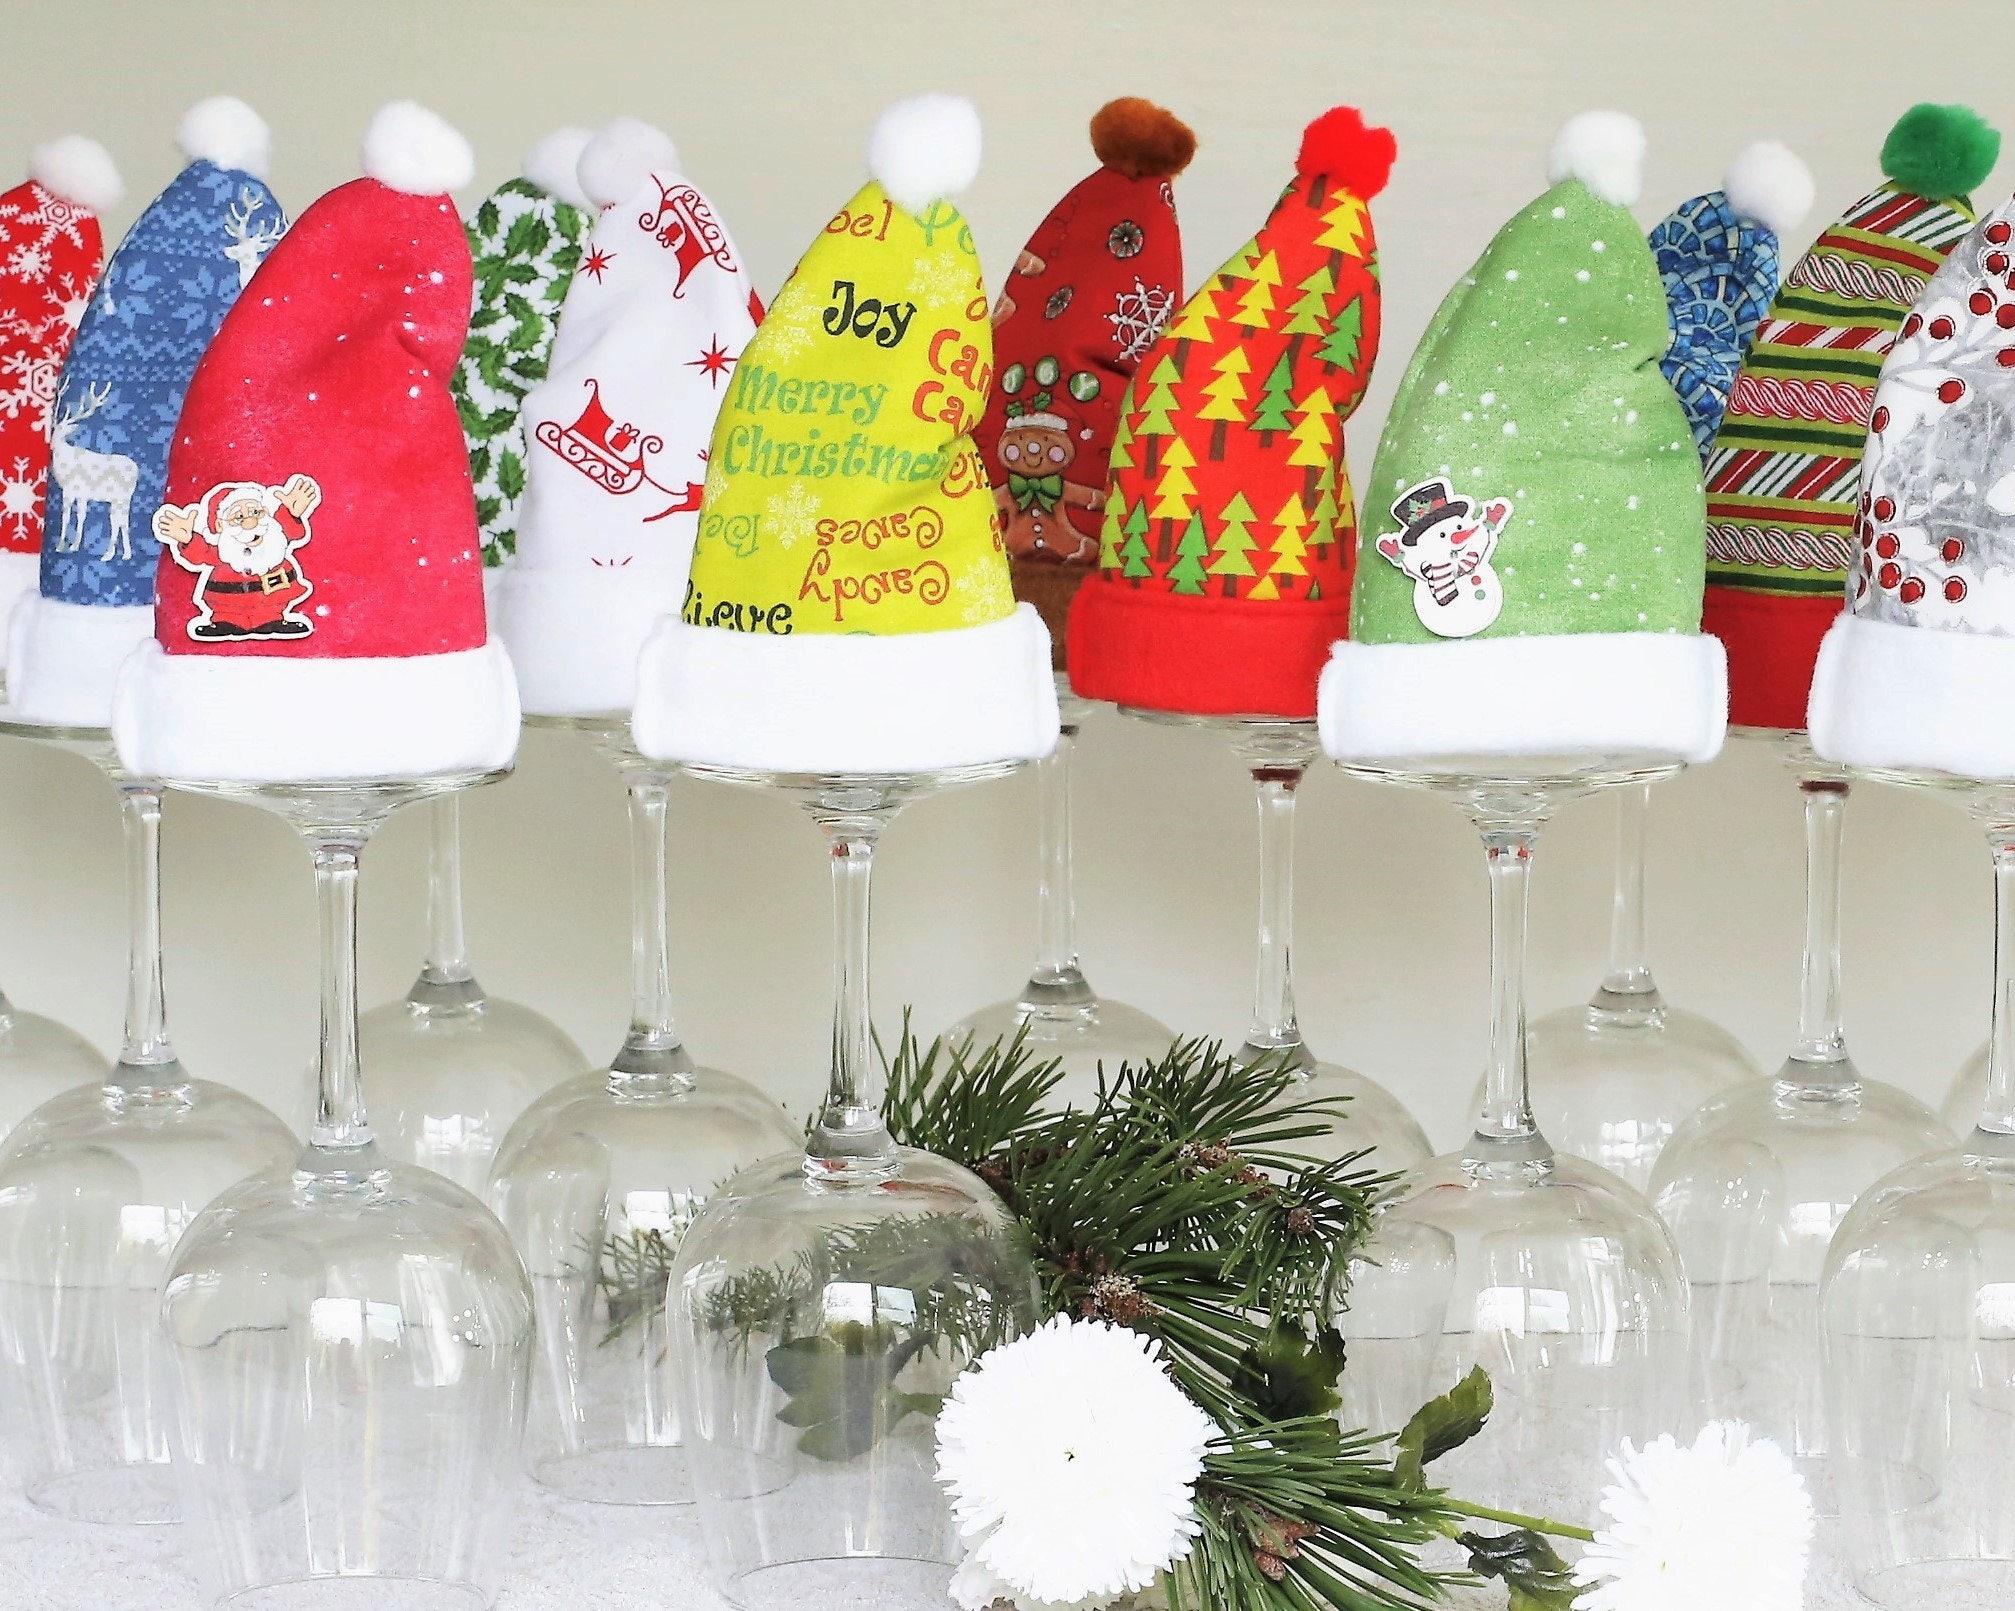 Hostess, Hostess Gift Ideas For Christmas Party Decorations Ideas, Wine